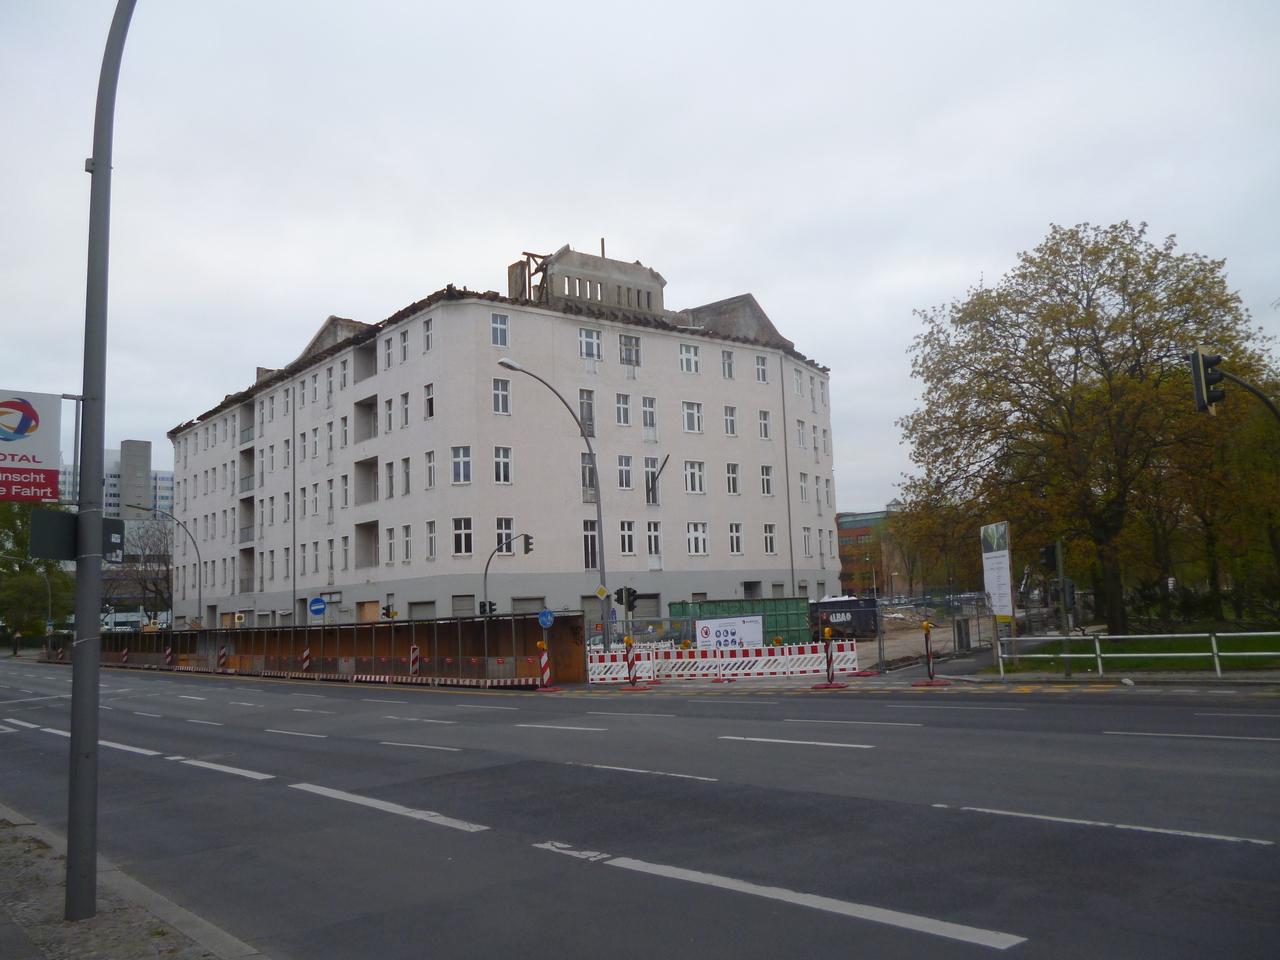 fennstrasse-abrissrlu4g.jpg